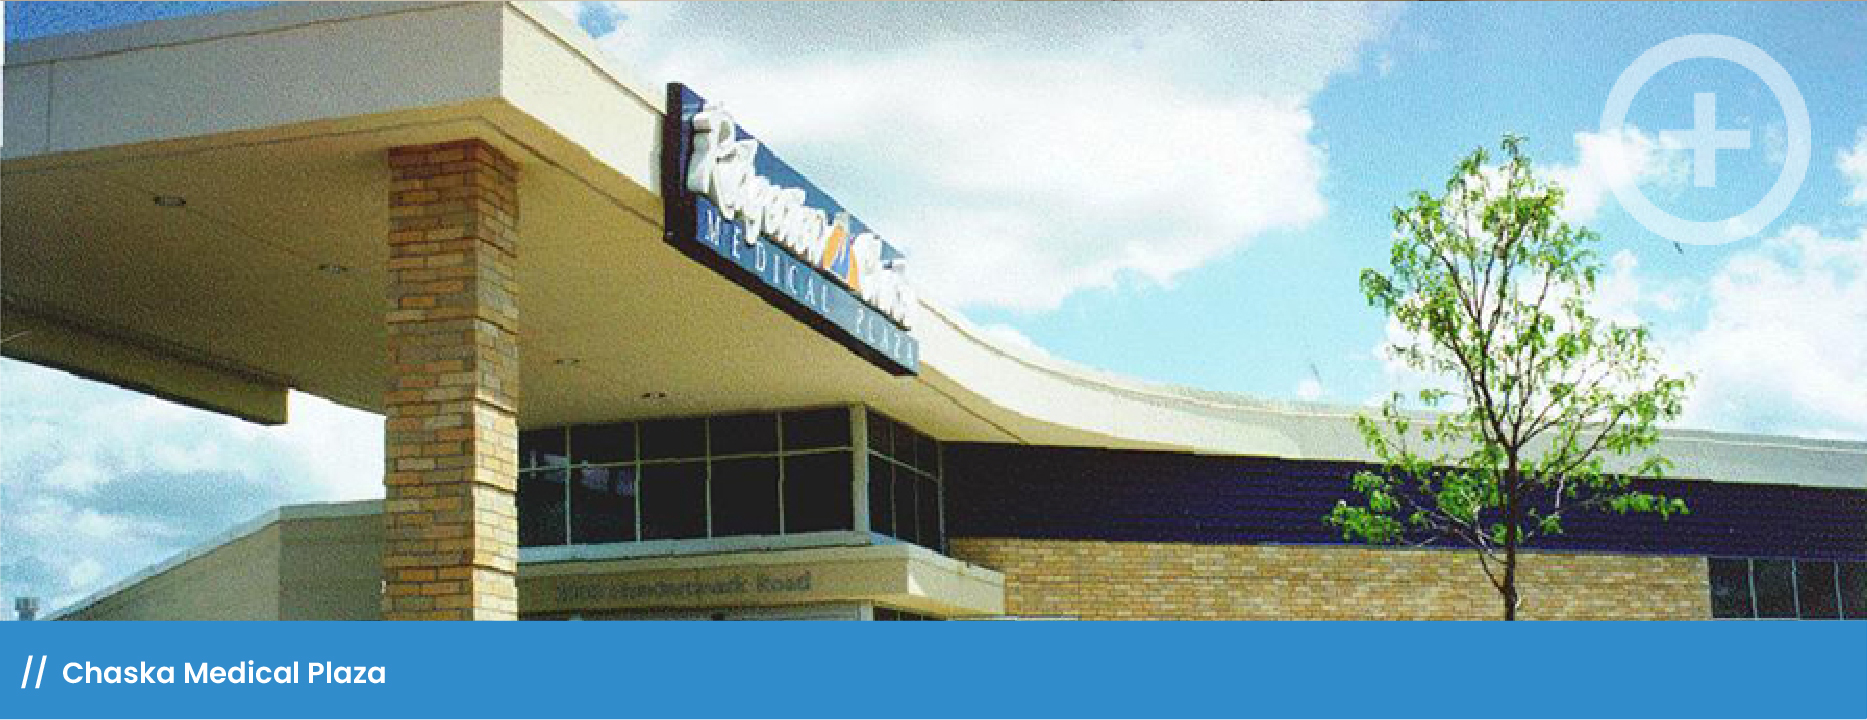 Yanik-Watermark_Chaska Medical Plaza